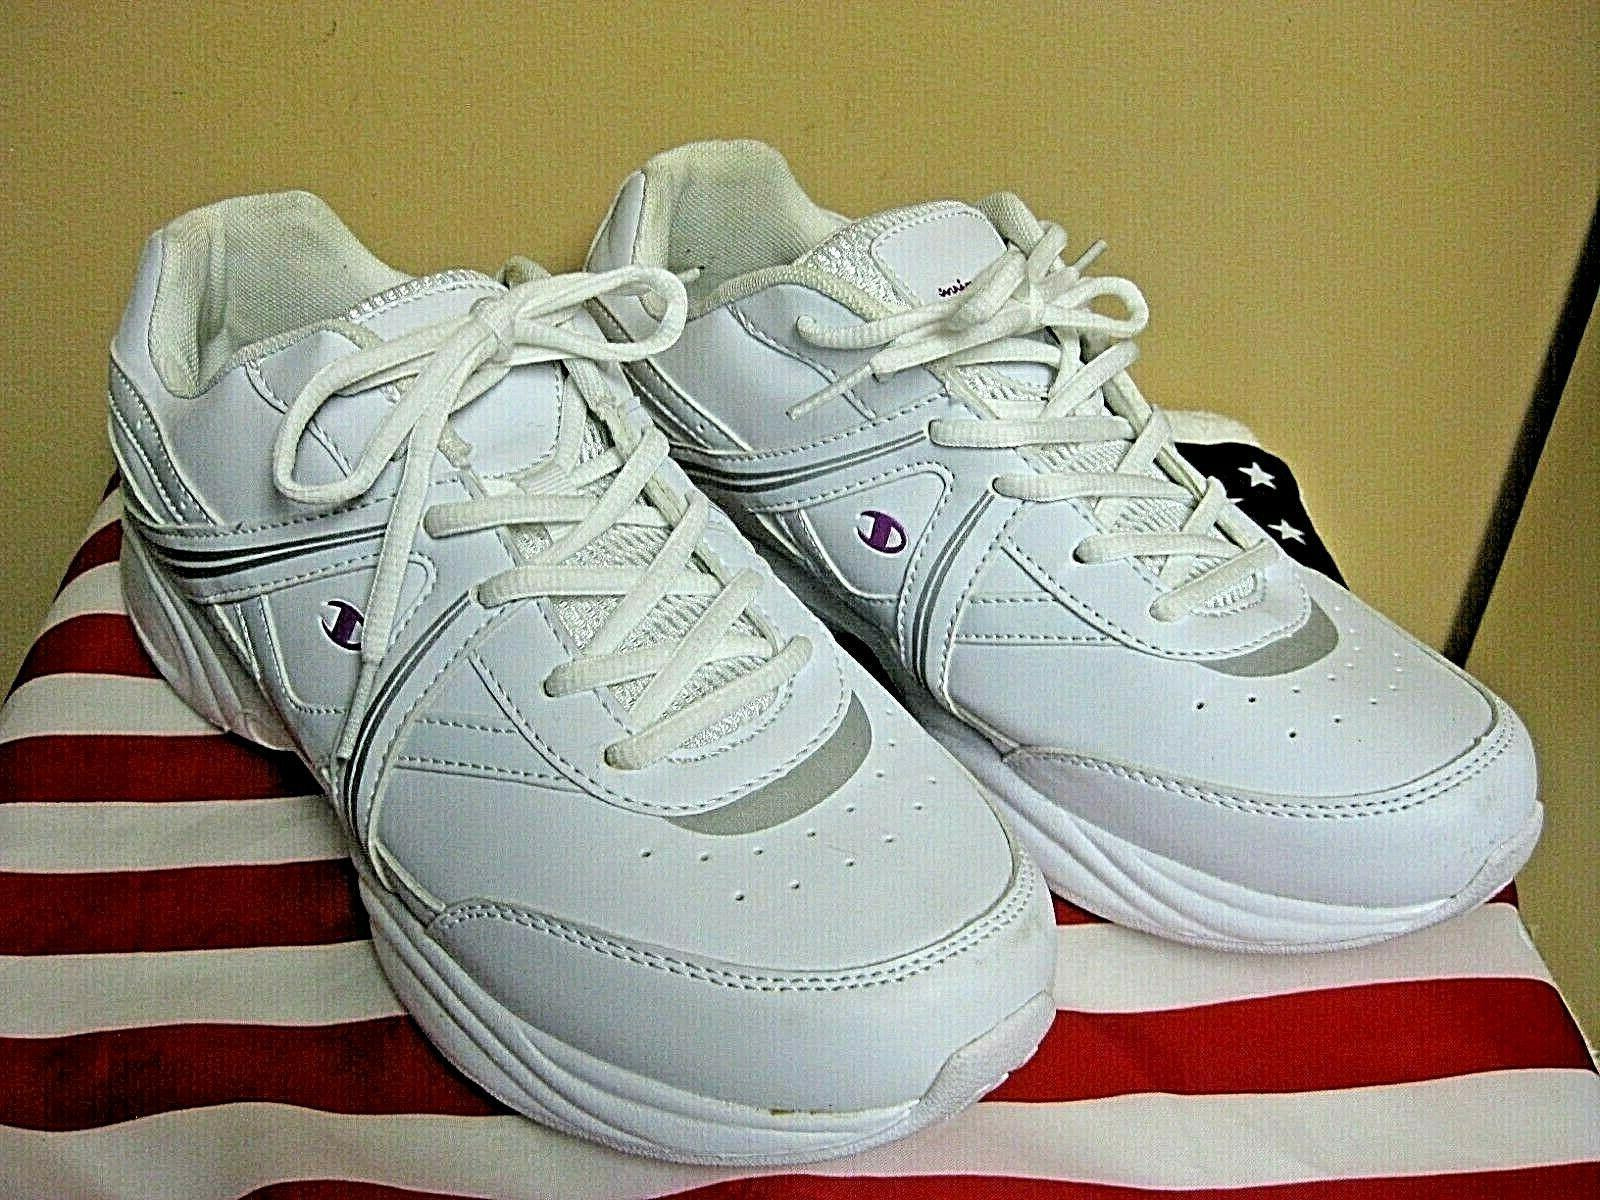 new women s white sneakers walking tennis